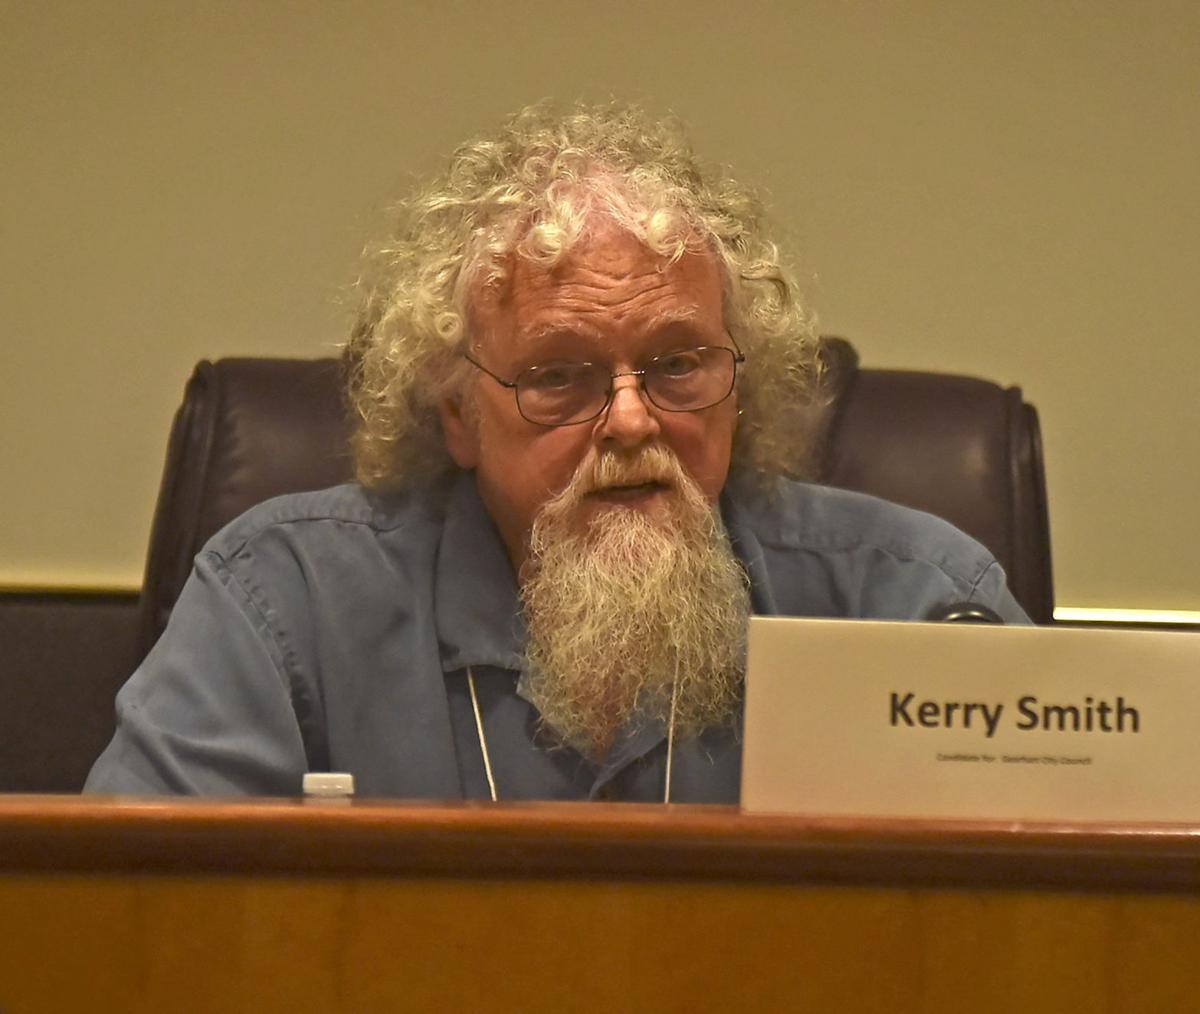 Kerry Smith